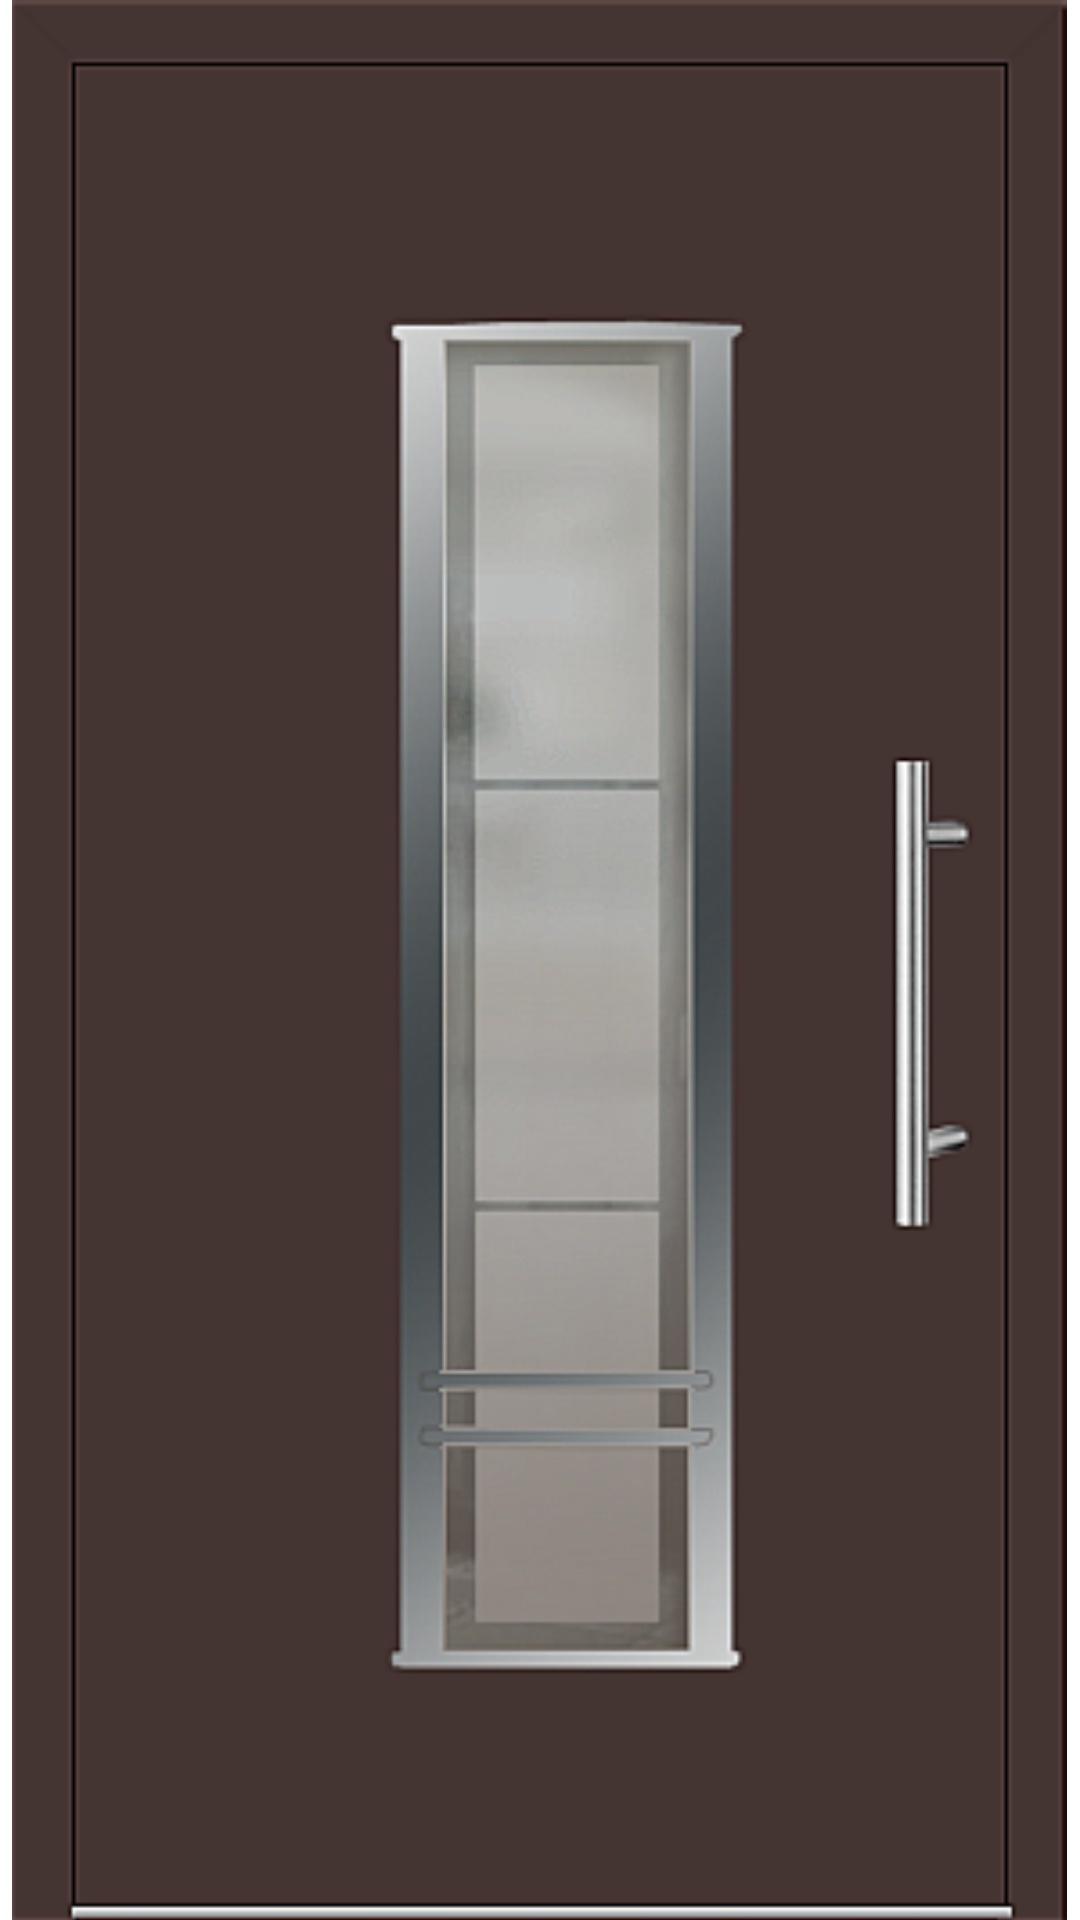 Aluminium Haustür Modell 6817-79 mahagonibraun